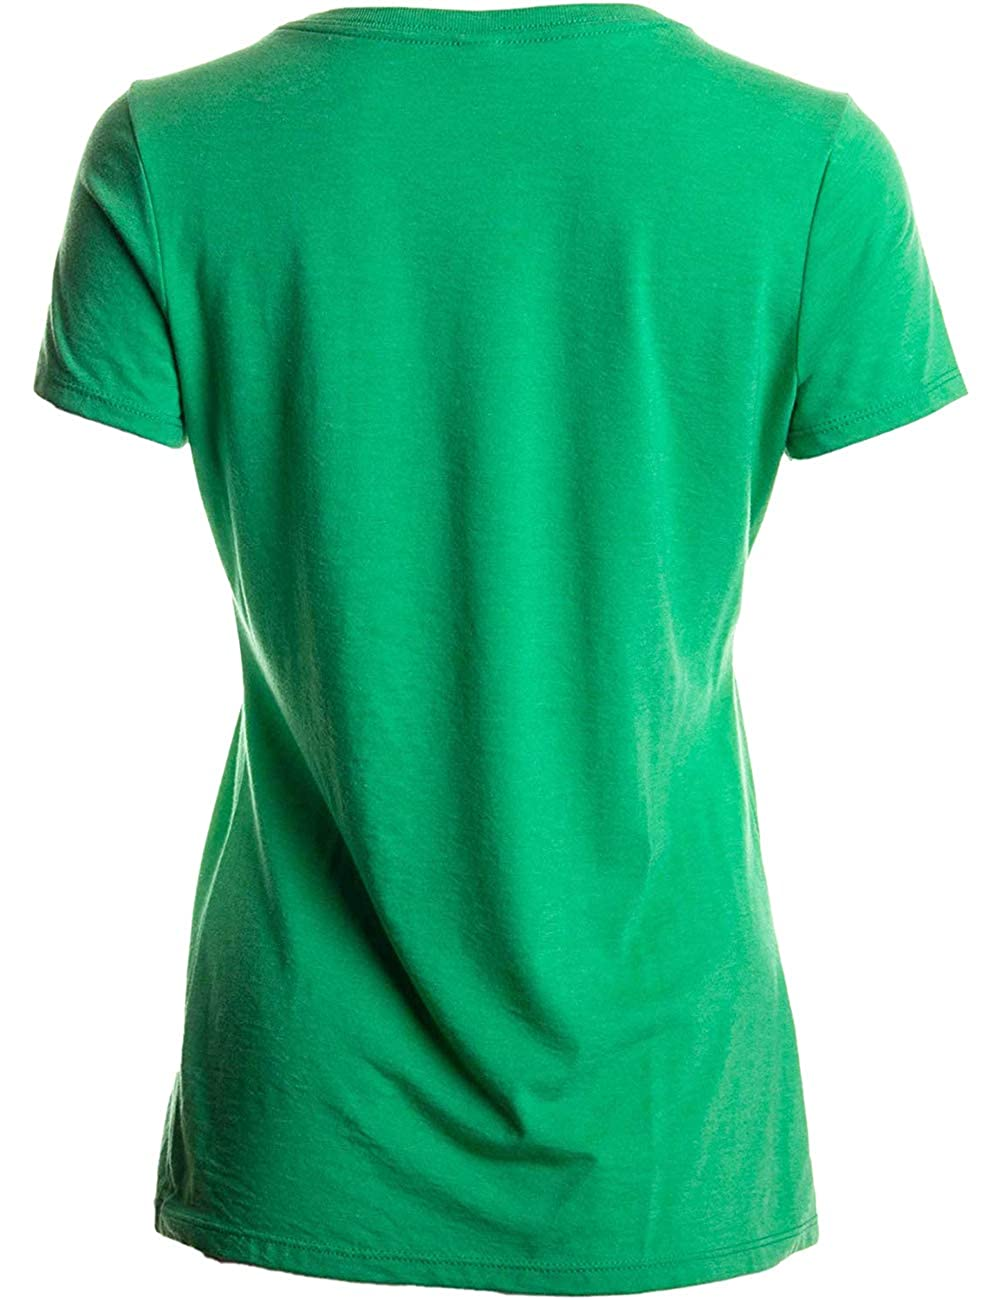 3a07aefa2 Amazon.com: Joywow Women St Patrick's Day Shirt Irish Green Shamrock T- Shirts Print V-Neck Short Sleeve St Patrick's Day Tee Shirt Funny: Clothing